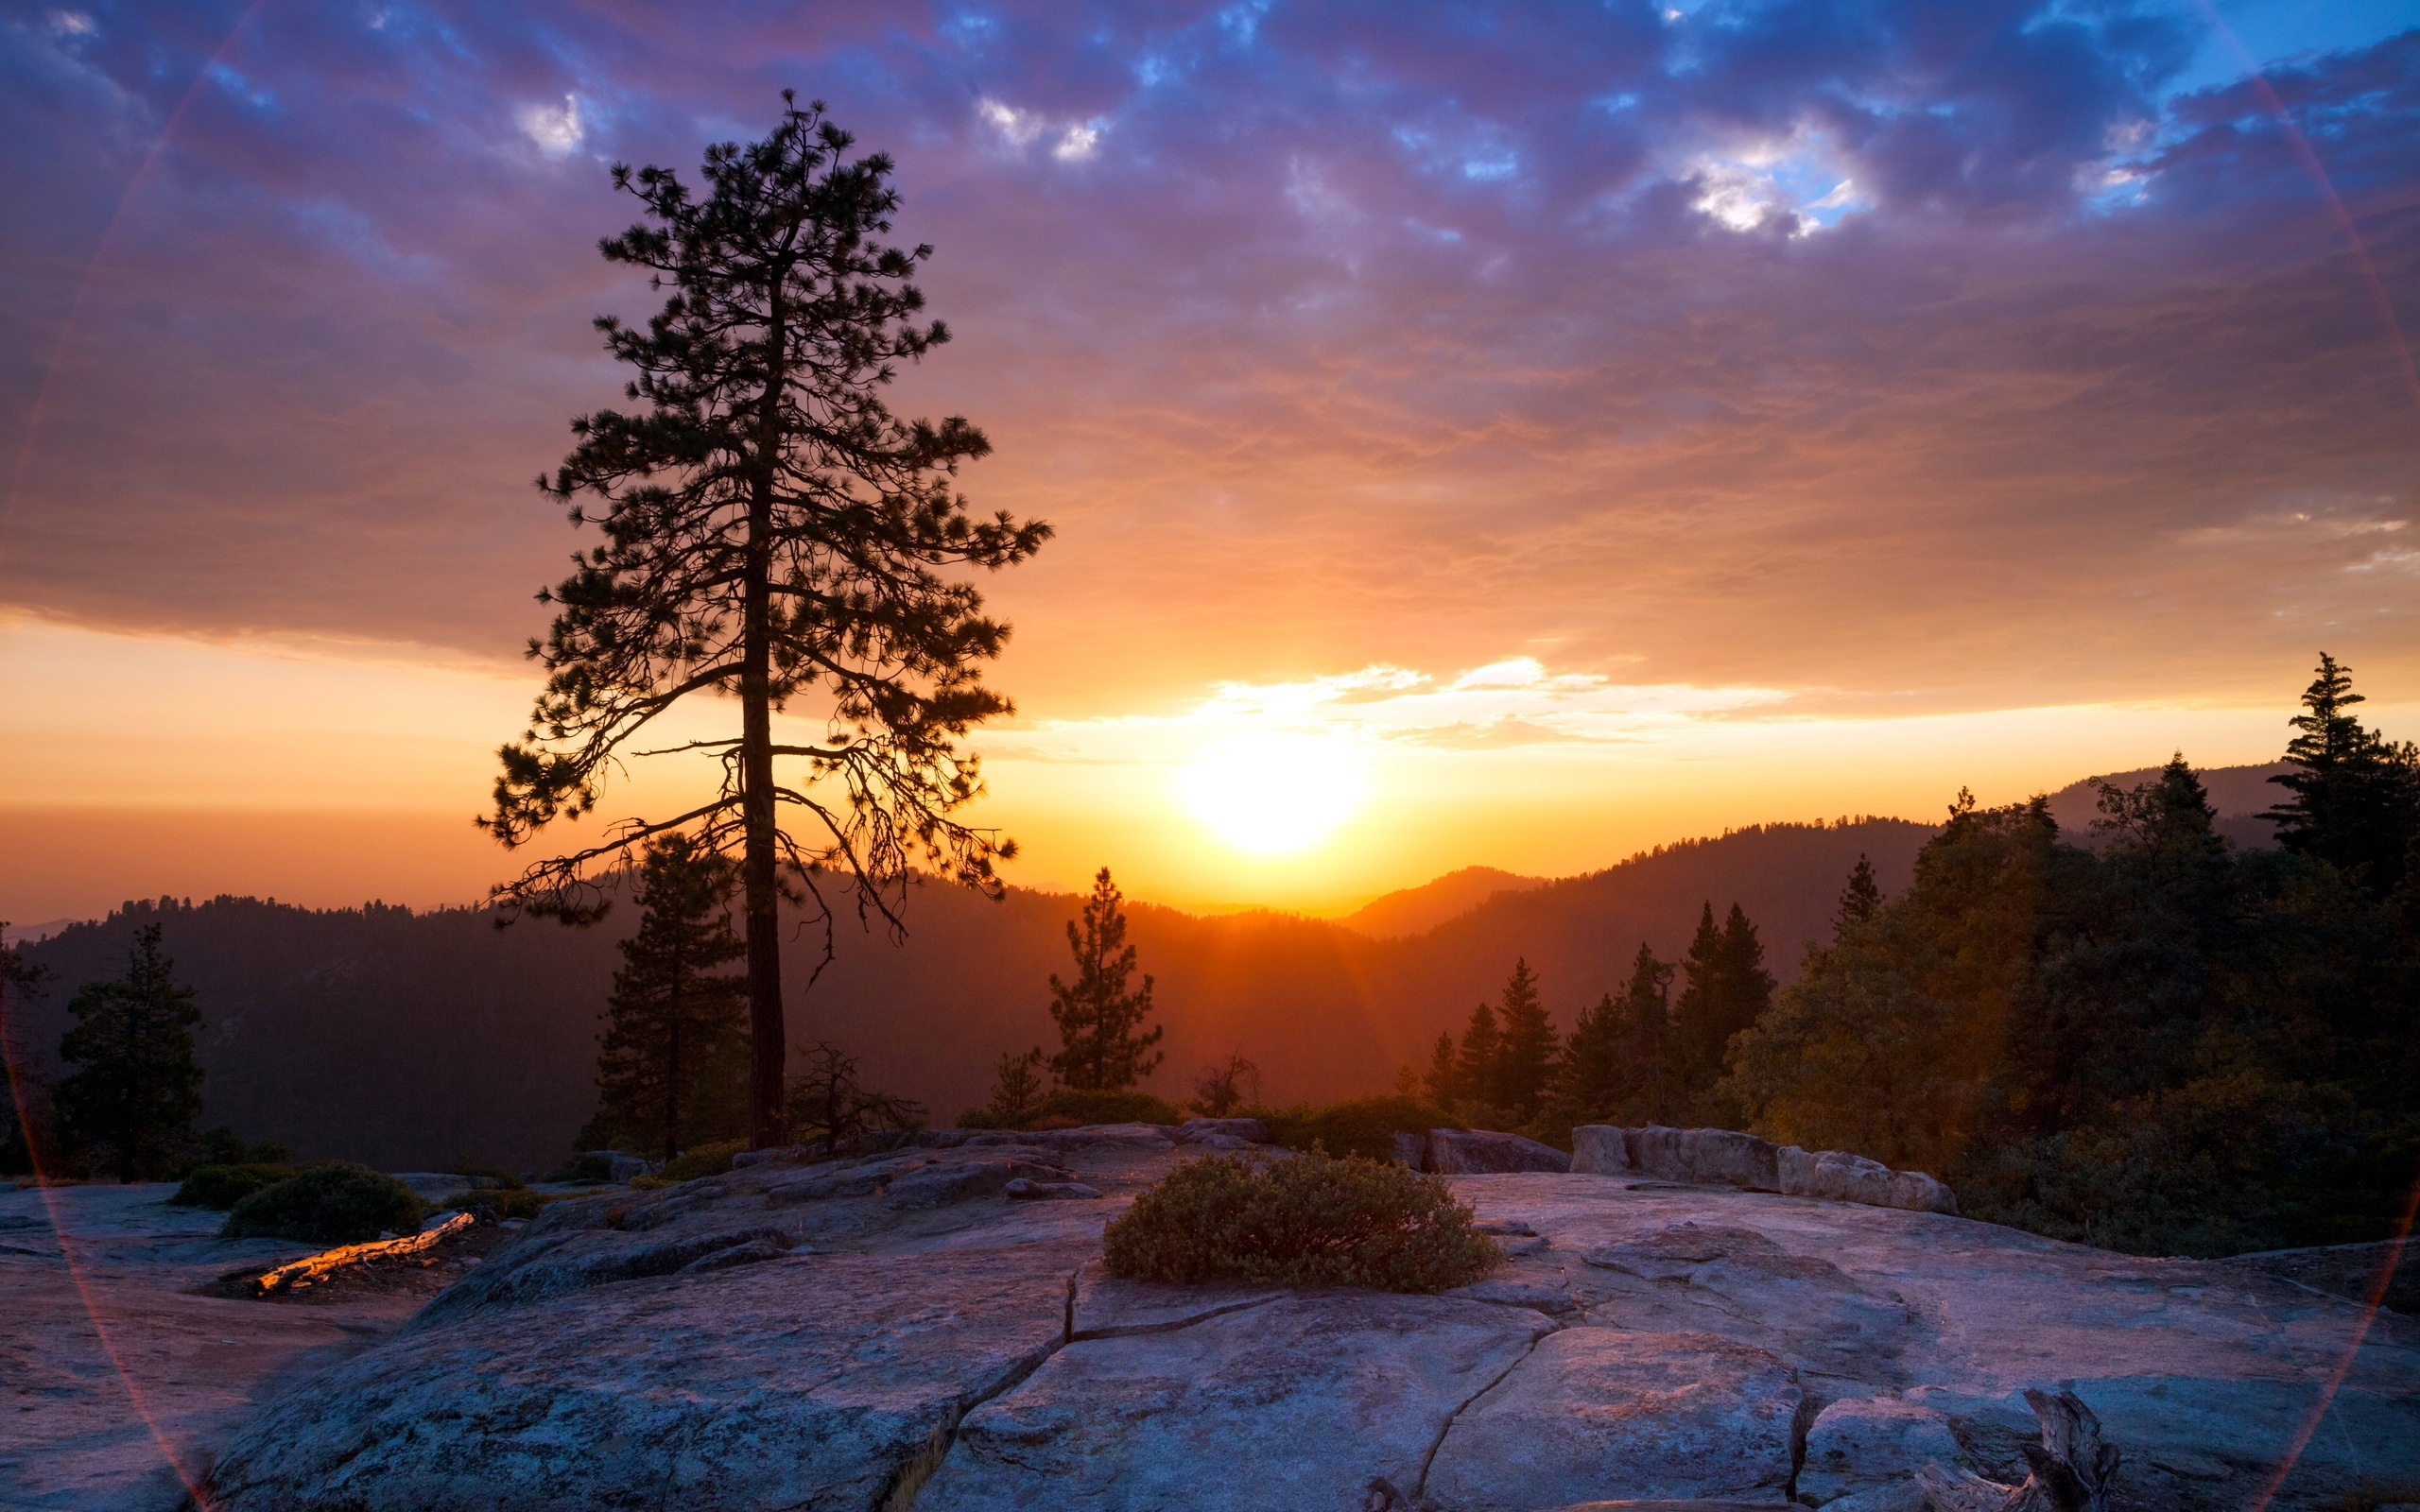 Wallpaper Sunrise On The Hill Beautiful Scenery 2560x1600 Hd